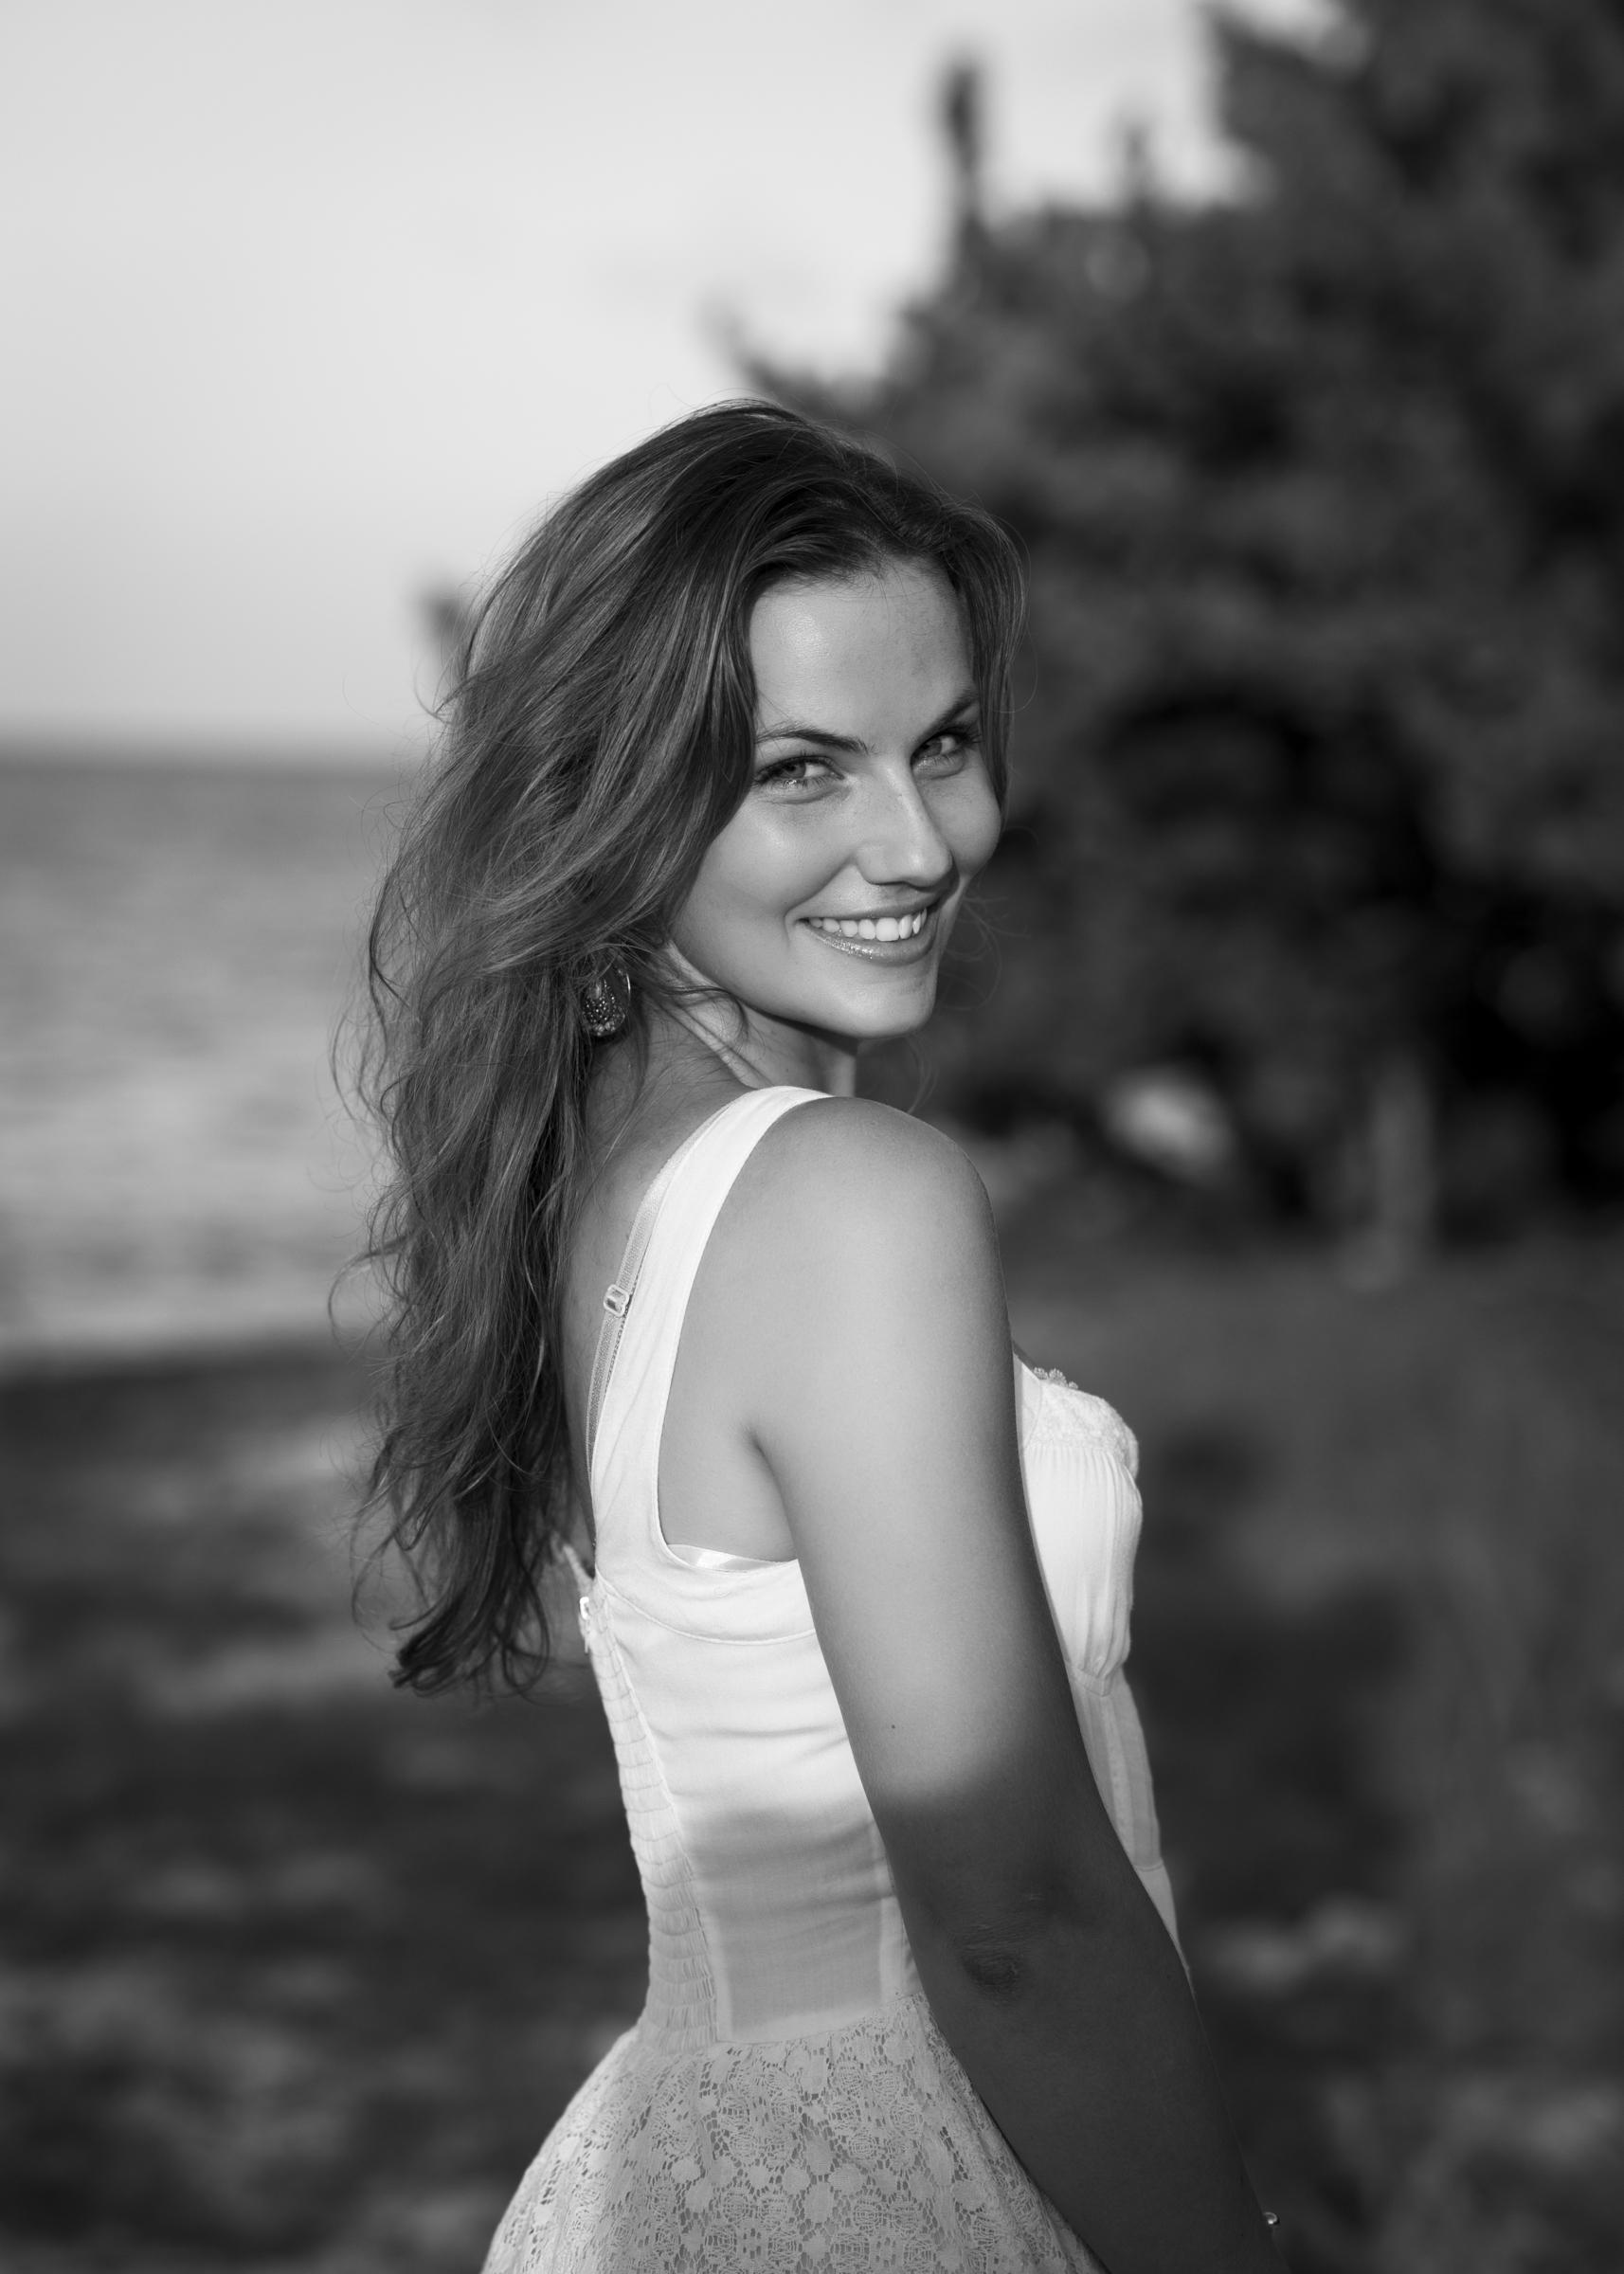 Stunning natural light portrait photographer Cayman #fashion